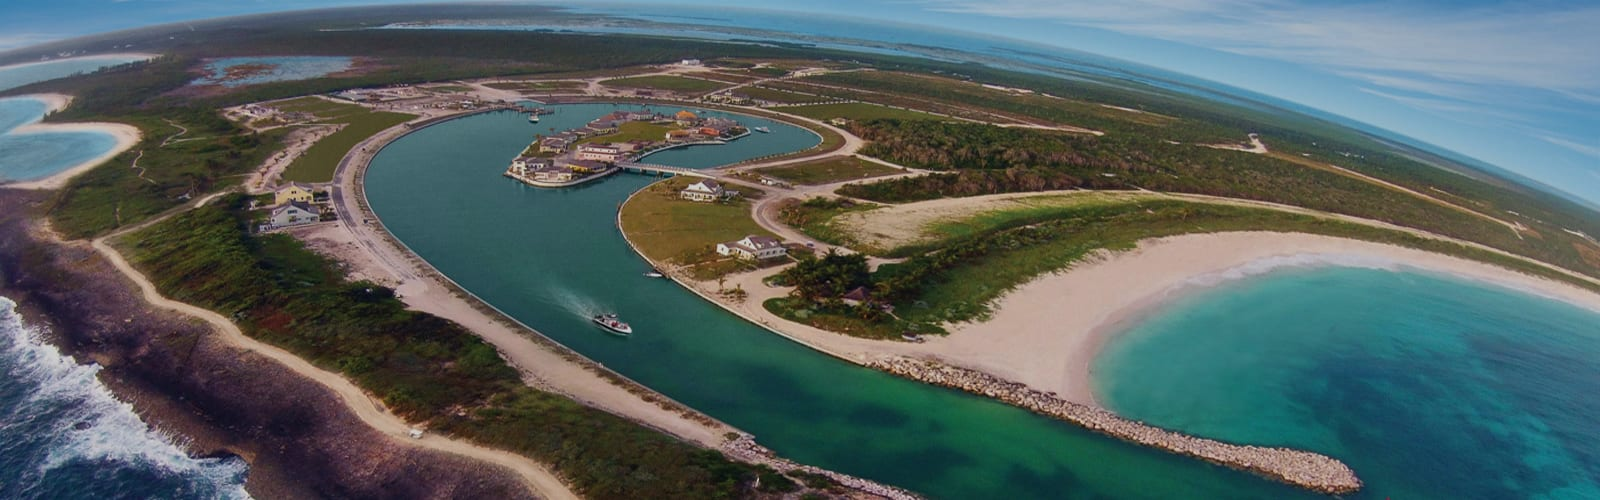 Schooner Bay aerial